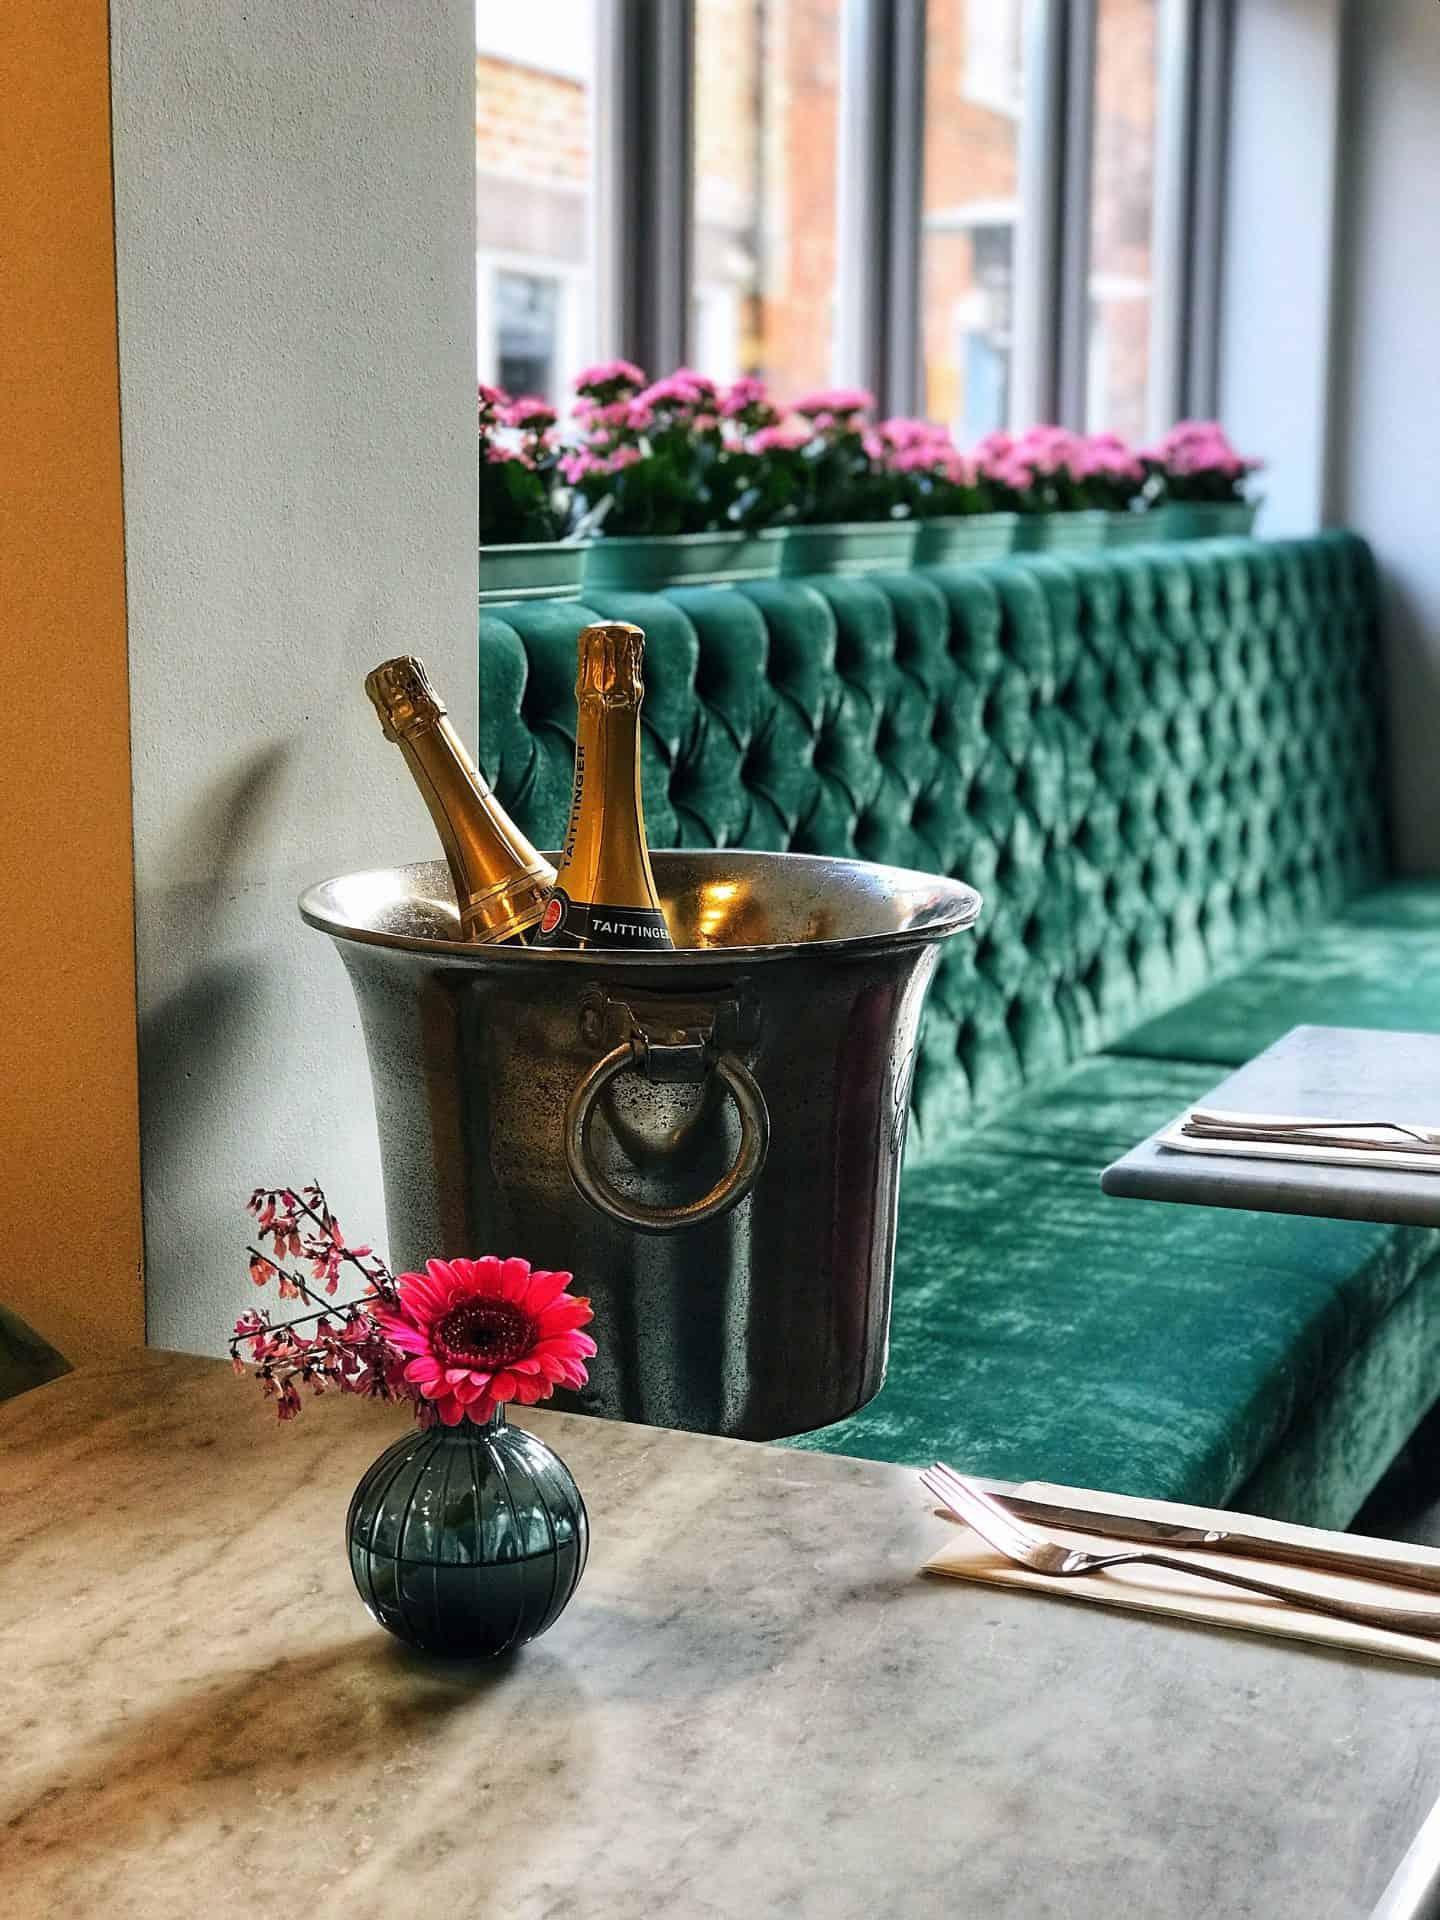 Inside French Affaire in Stony Stratford